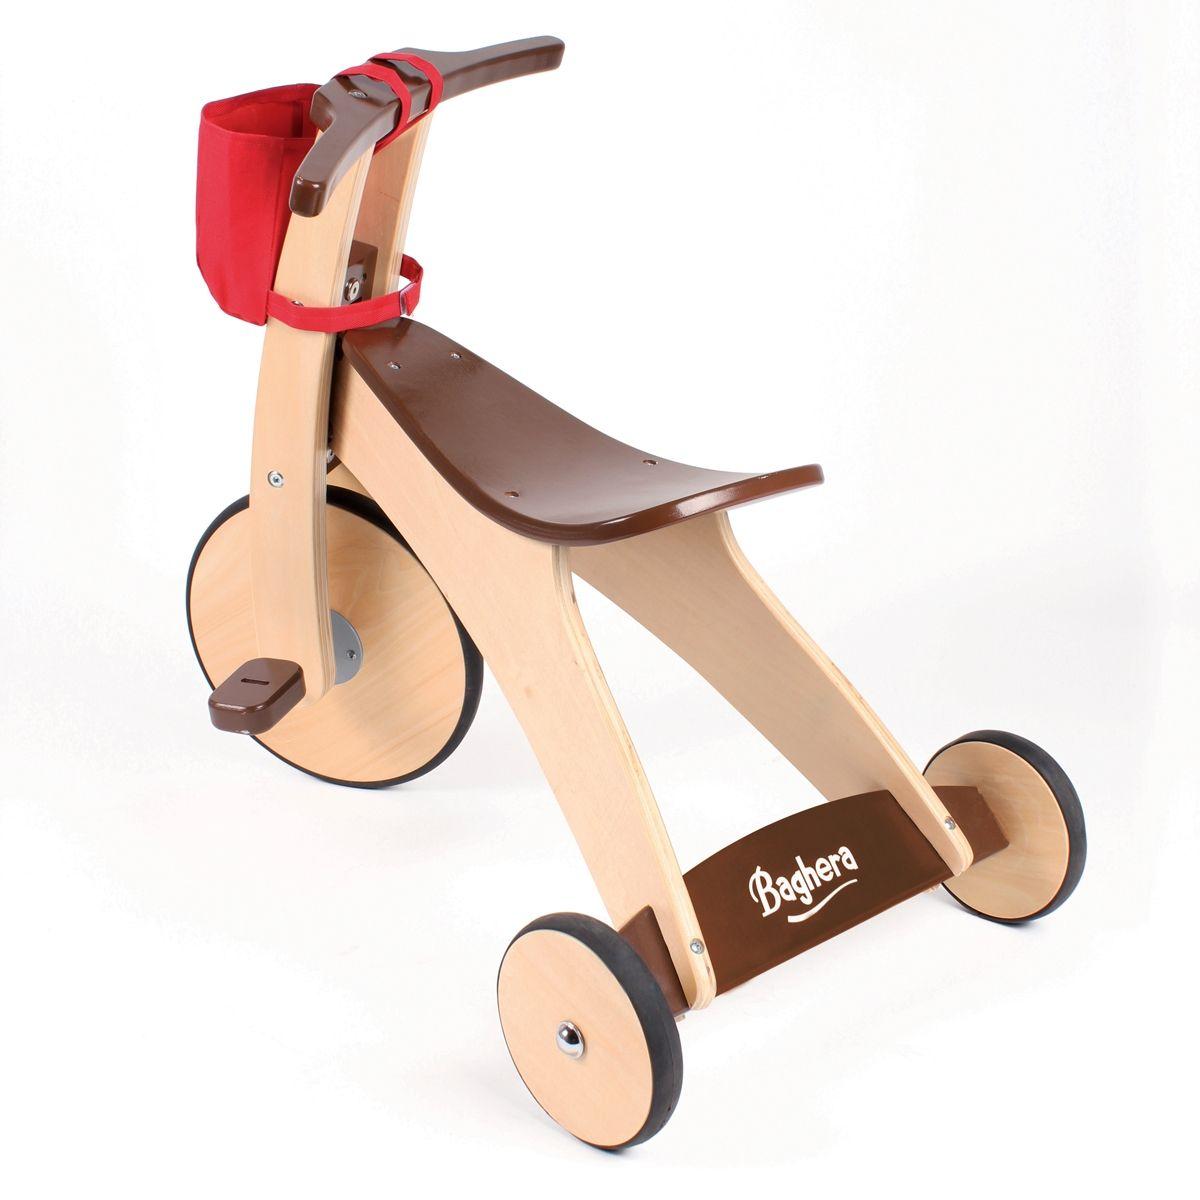 tricycle en bois baghera toys pinterest toy wooden. Black Bedroom Furniture Sets. Home Design Ideas